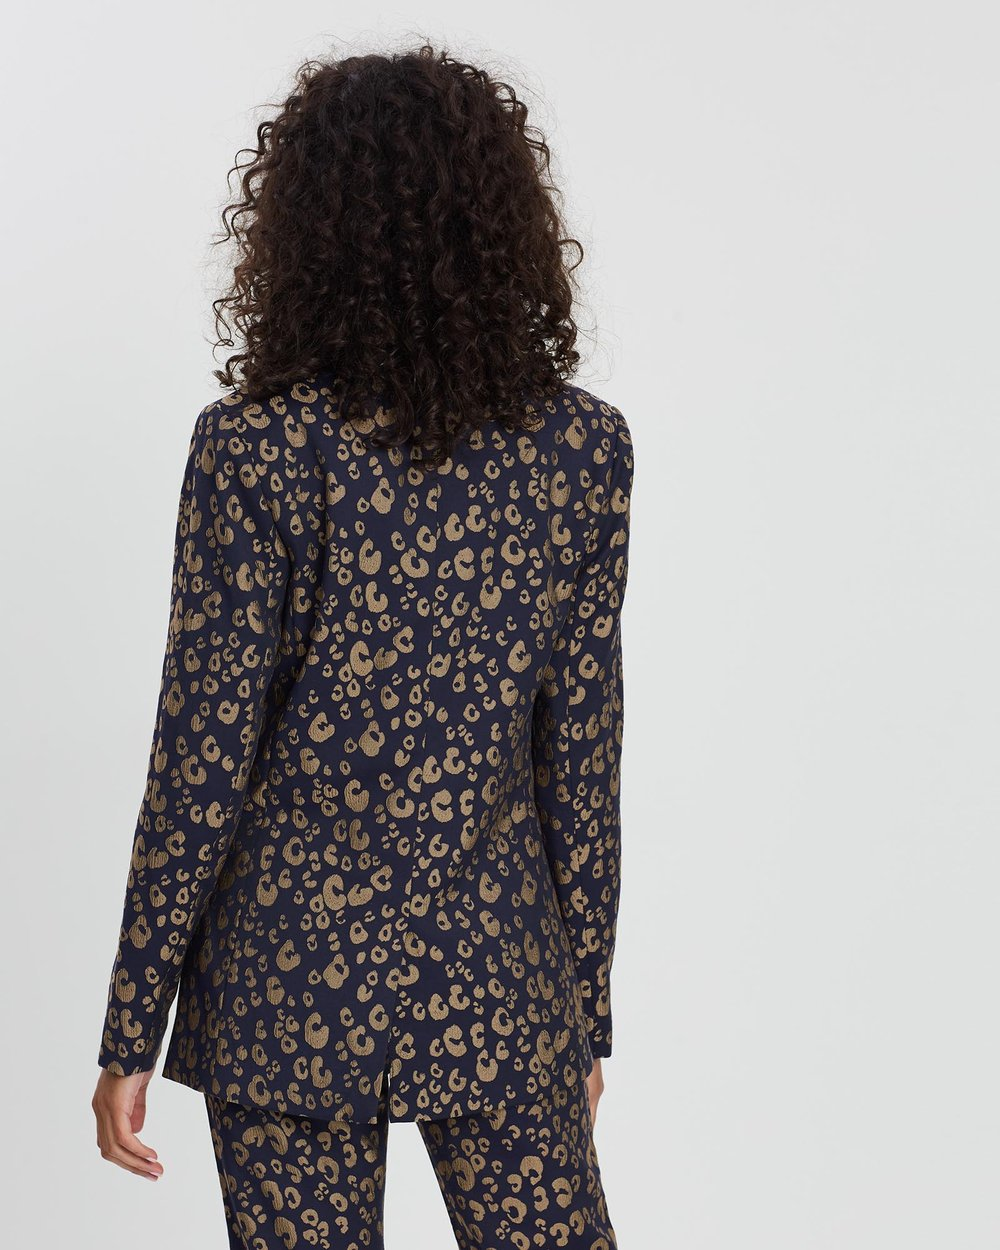 sale uk hot products best selling Leopard Print Jacquard Blazer by Scotch & Soda Online | THE ...